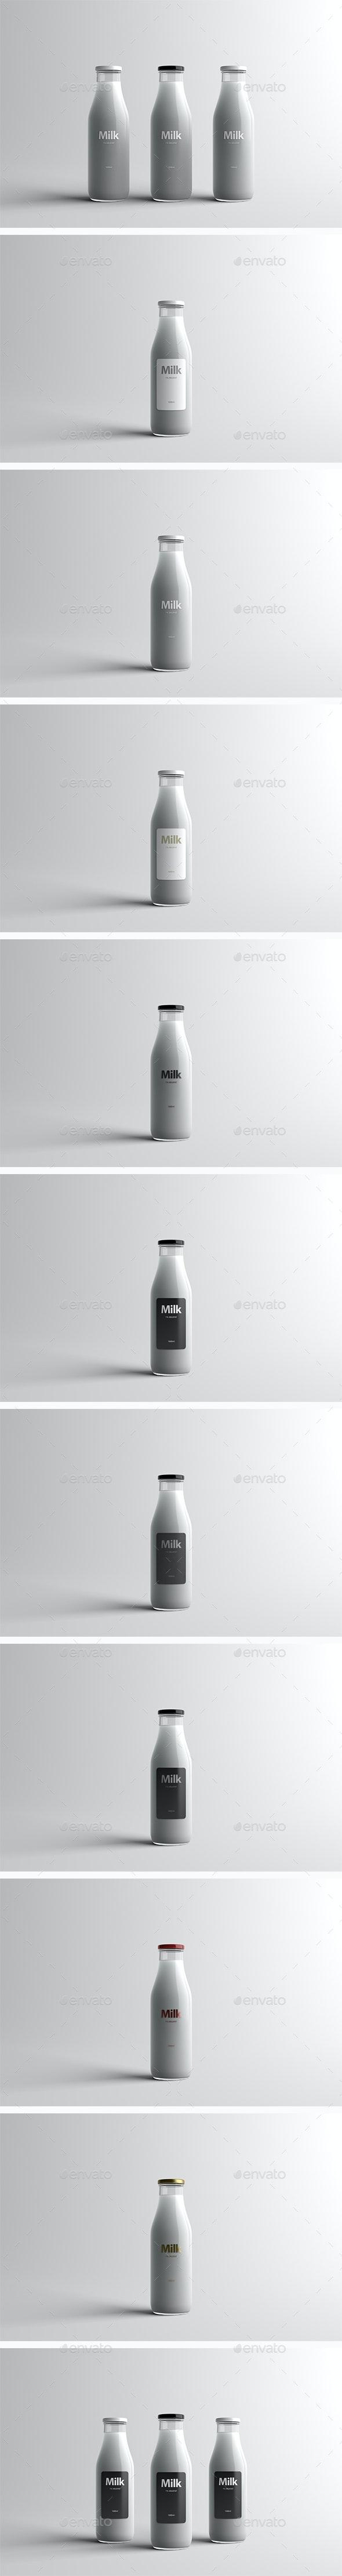 Milk Bottle Packaging Mock-Up - Food and Drink Packaging